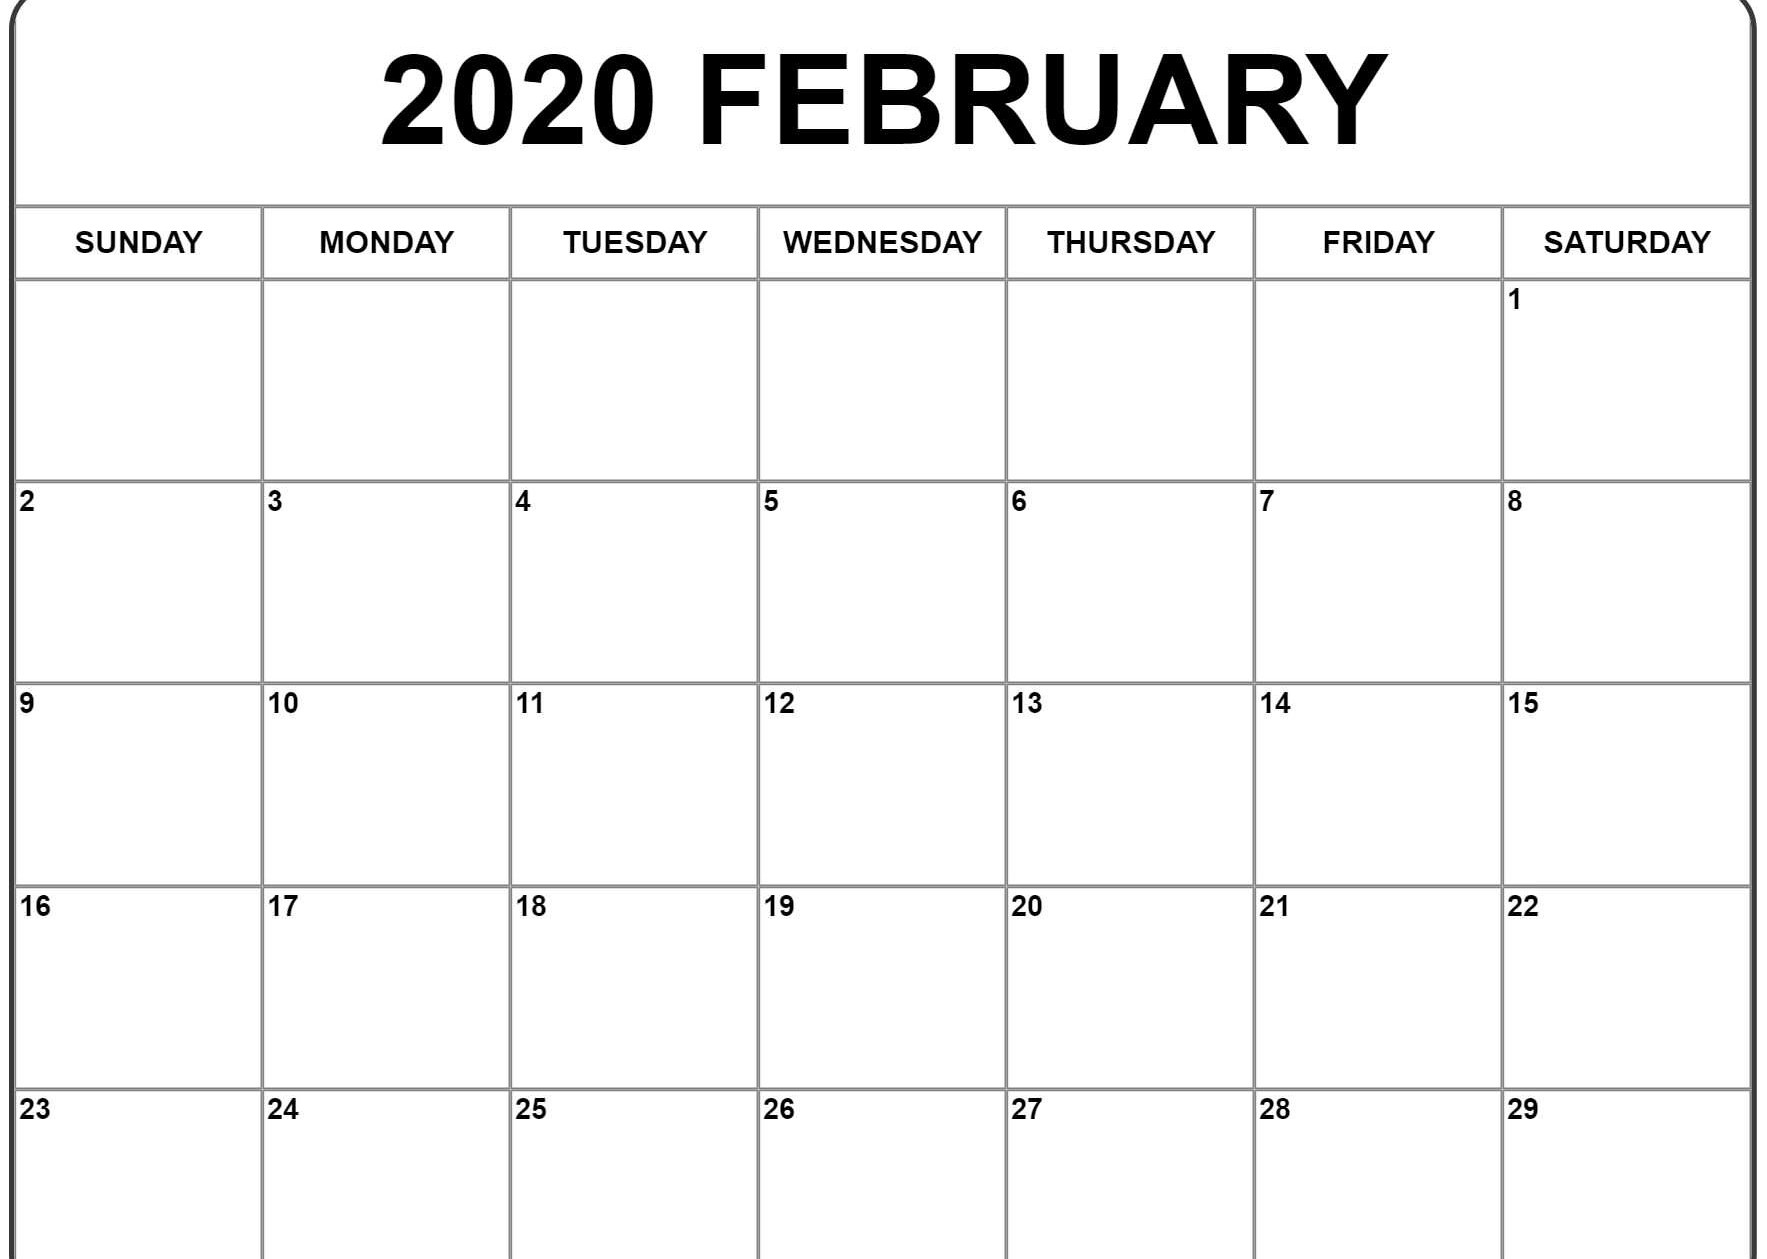 February 2020 Calendar Xls